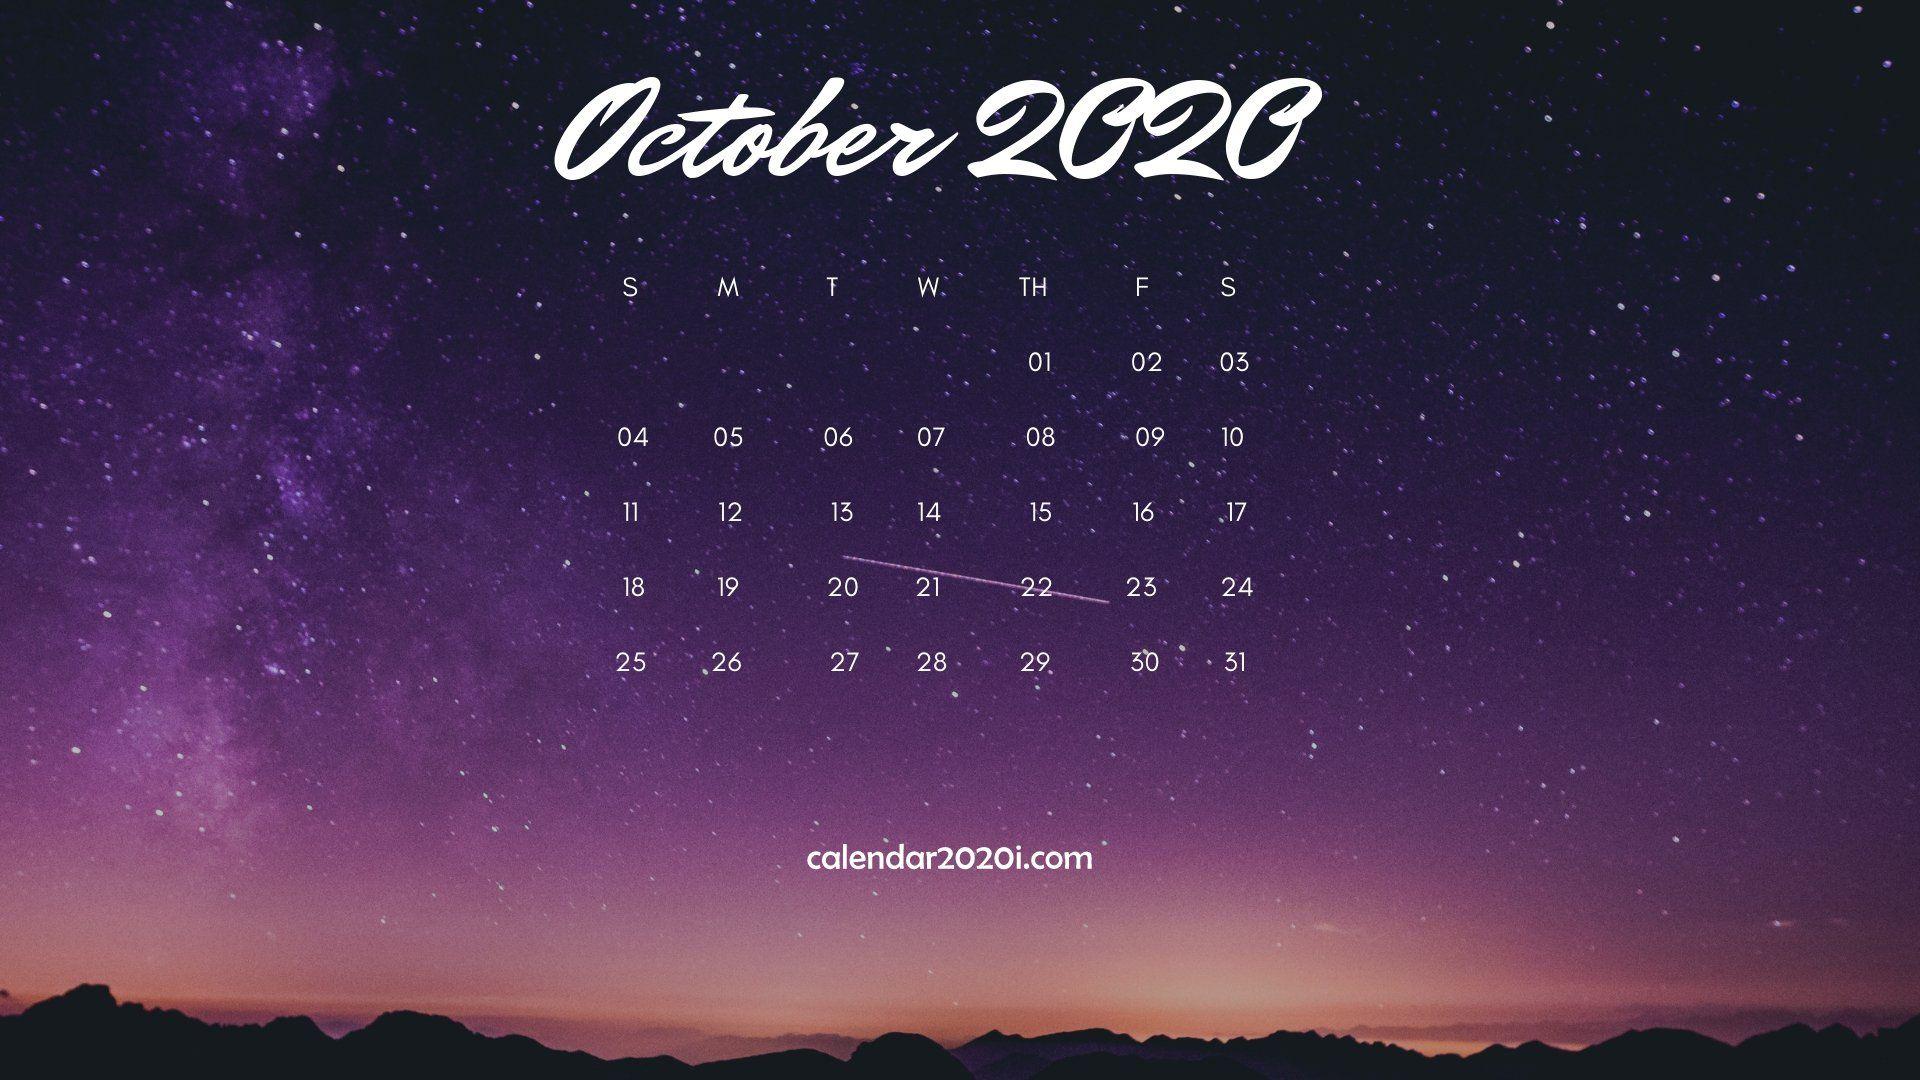 October 2020 Calendar Wallpapers   Top October 2020 Calendar 1920x1080